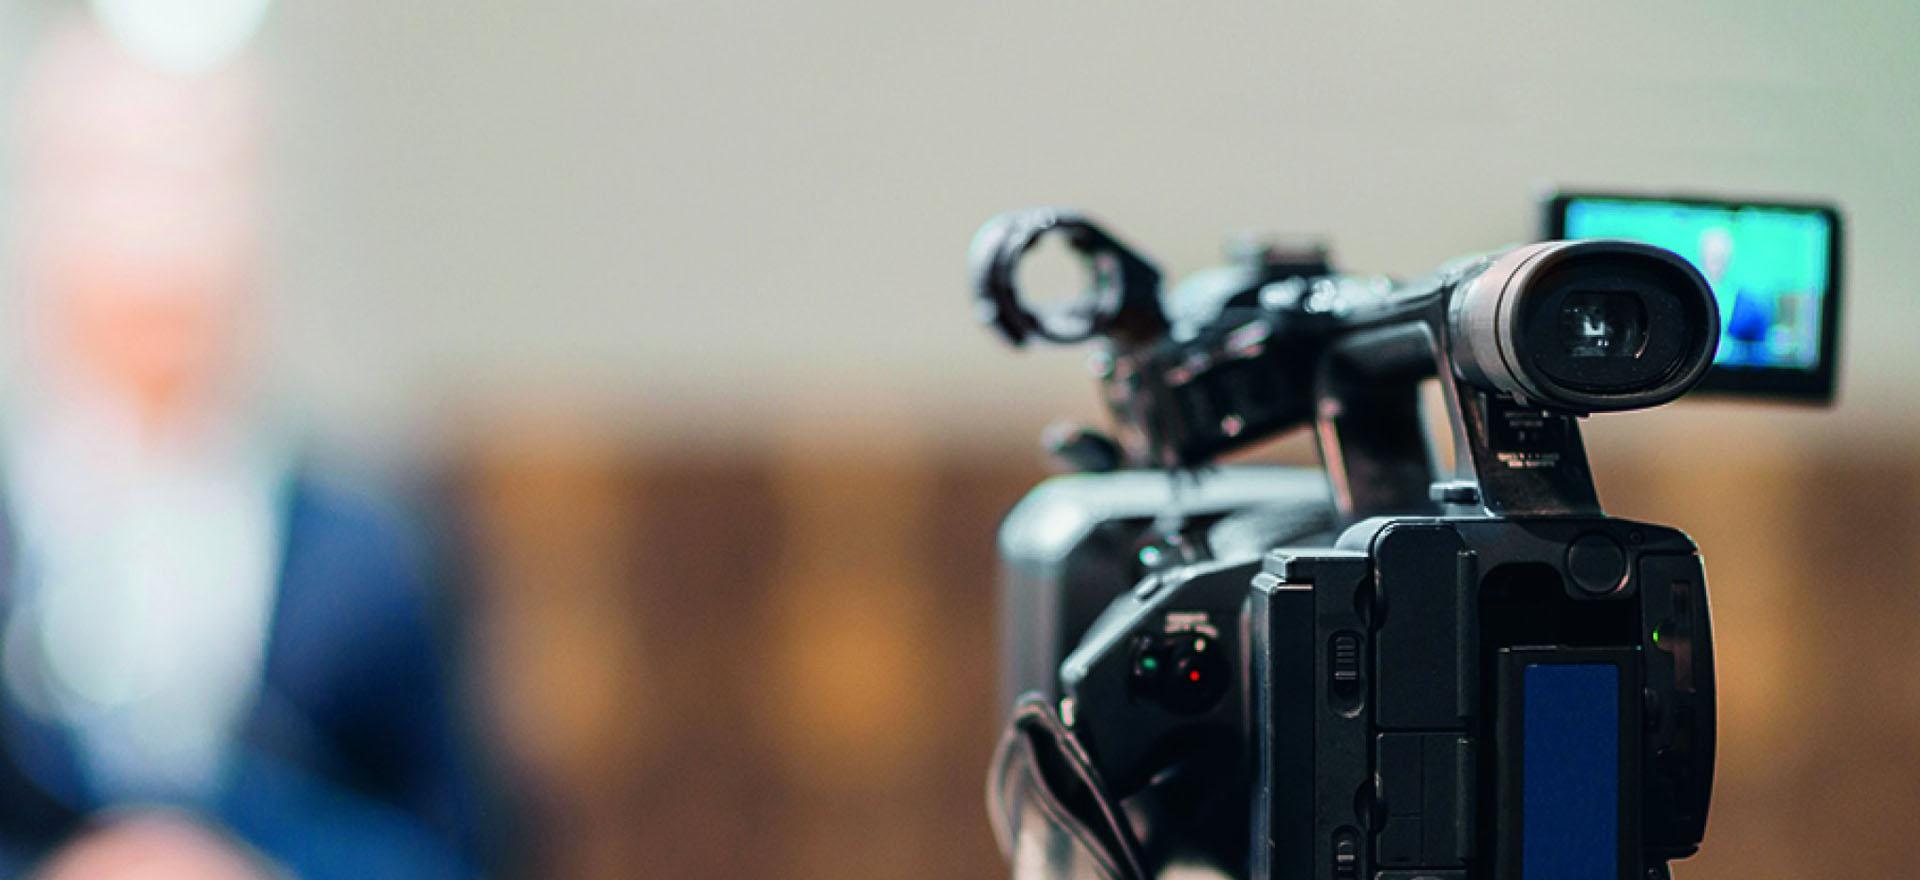 Kloosterhotel ZIN hybride online verbinden camera zoom teams